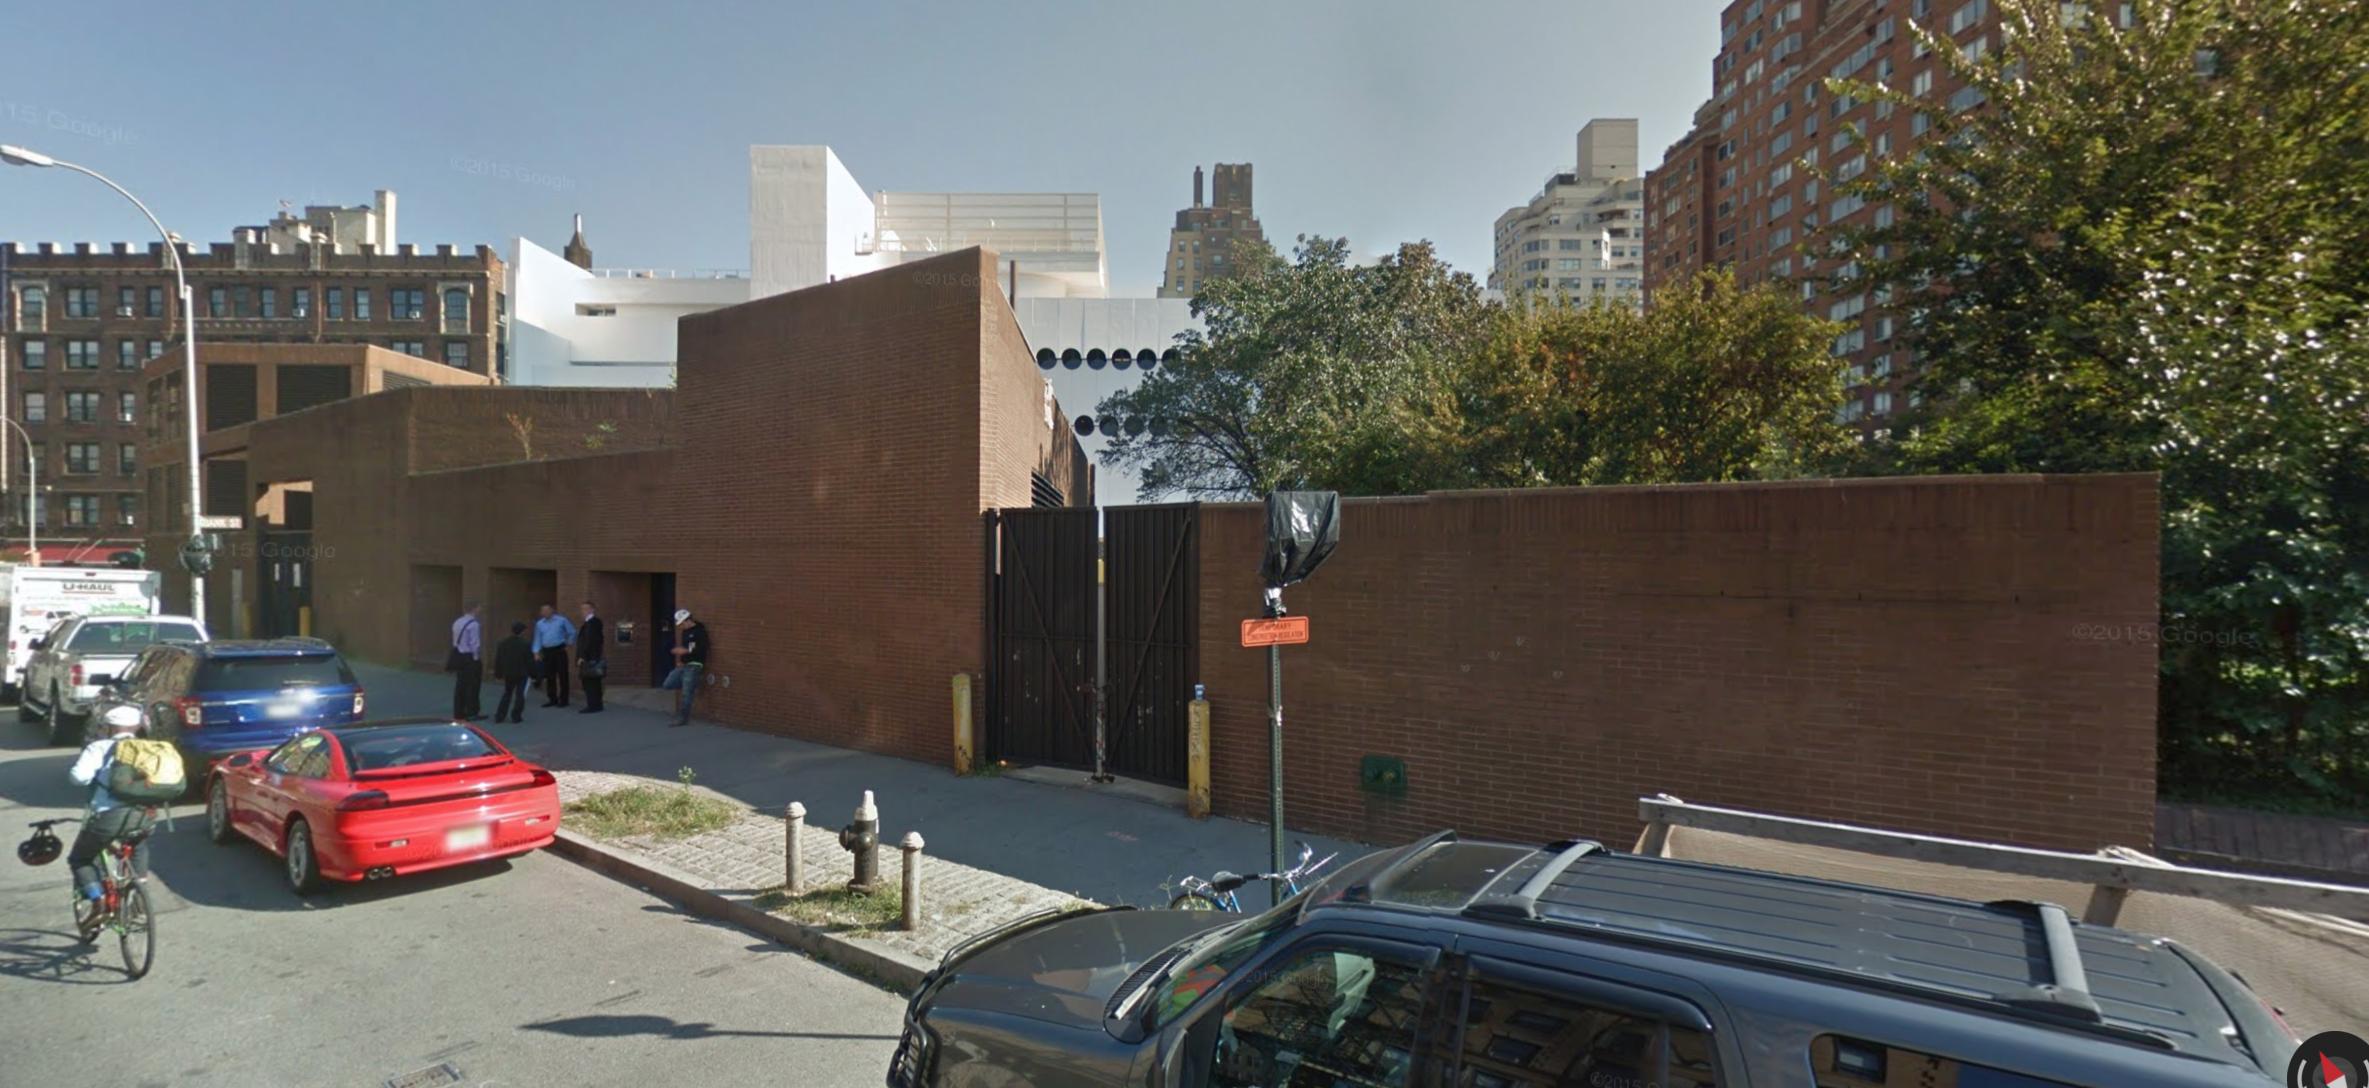 76 Greenwich Avenue in September 2014. Via Google Maps